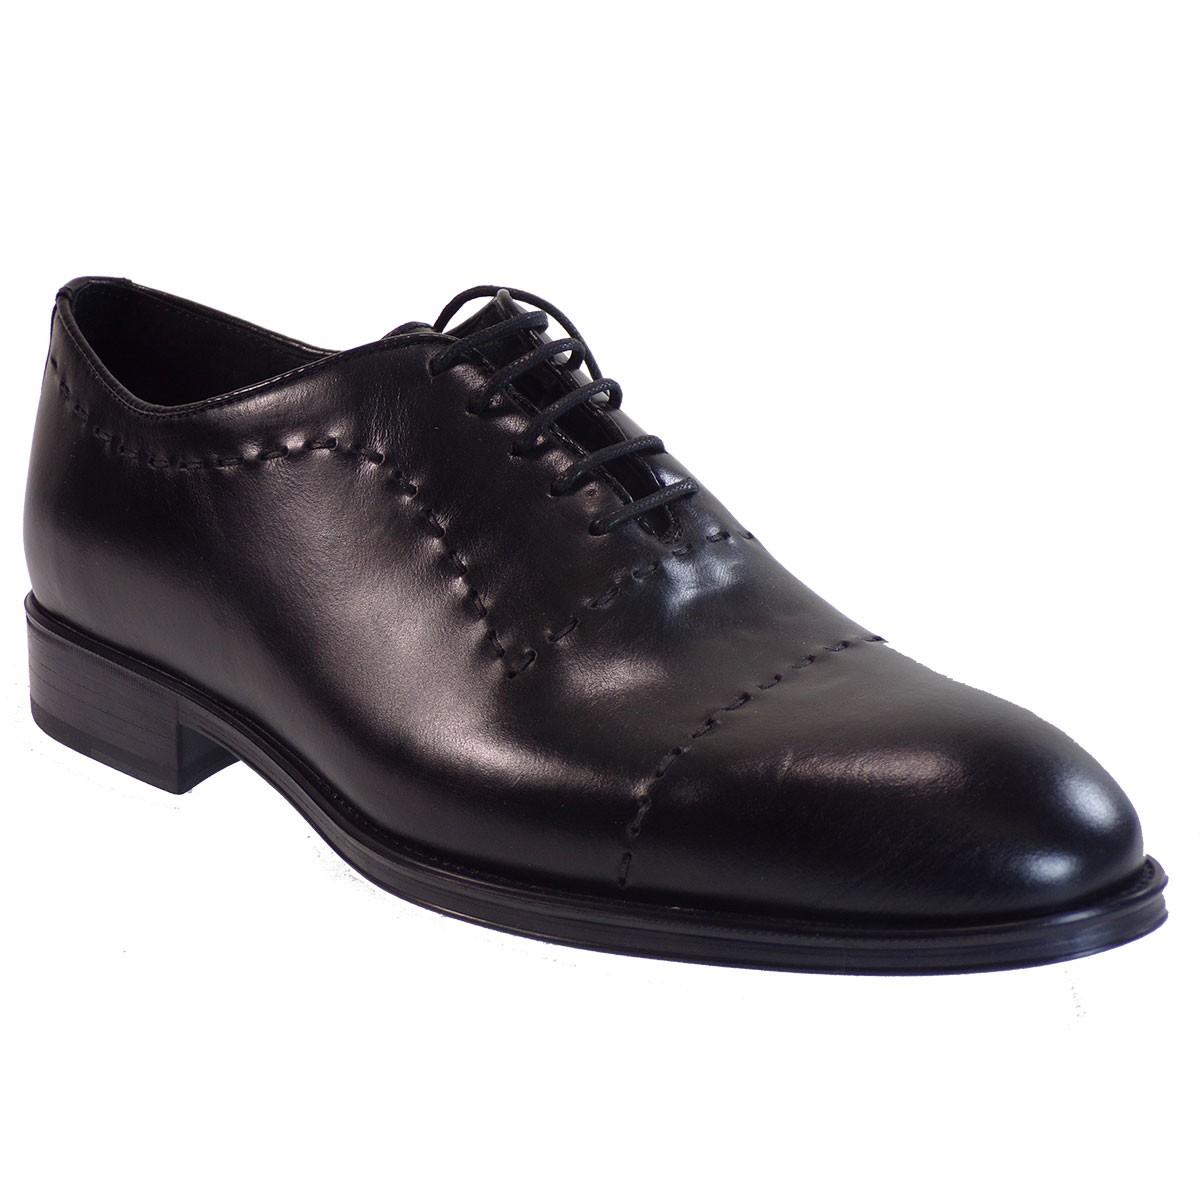 kricket Ανδρικά Παπούτσια 6615 Μαύρο Δέρμα